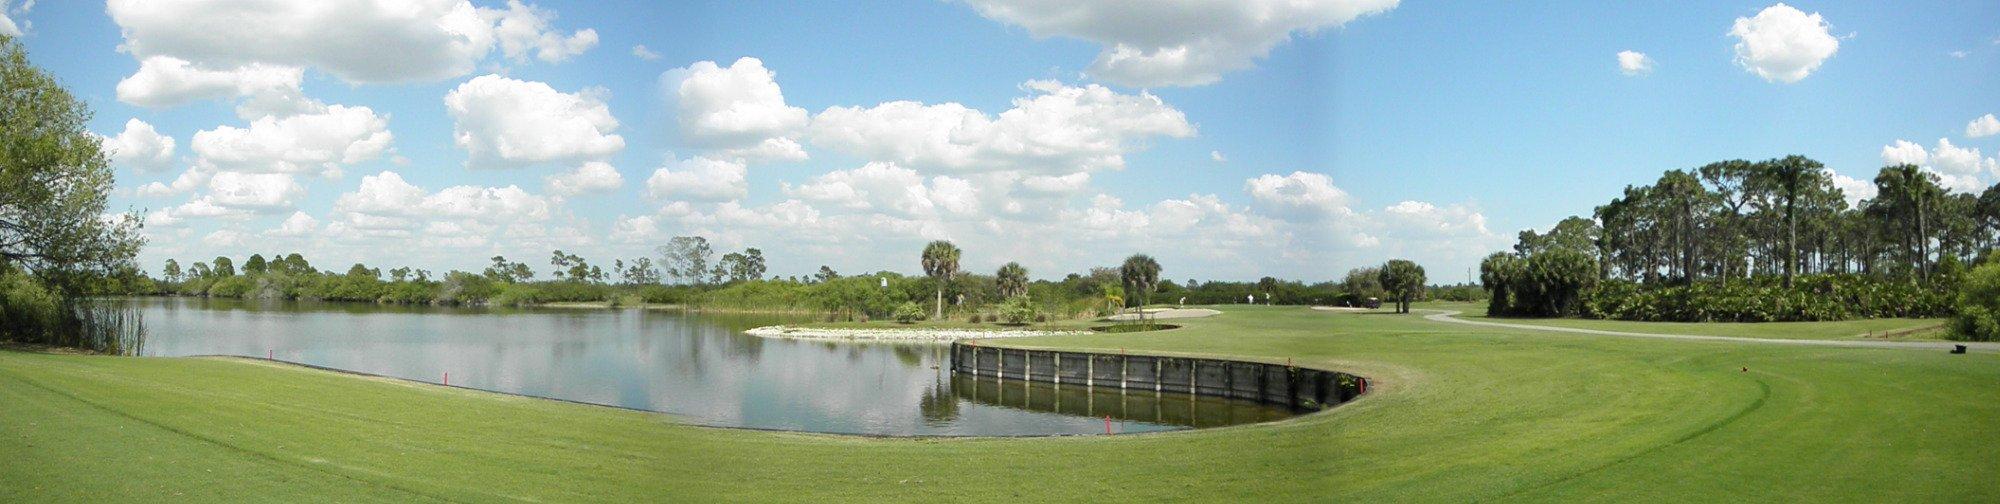 Myakka Pines Golf Club